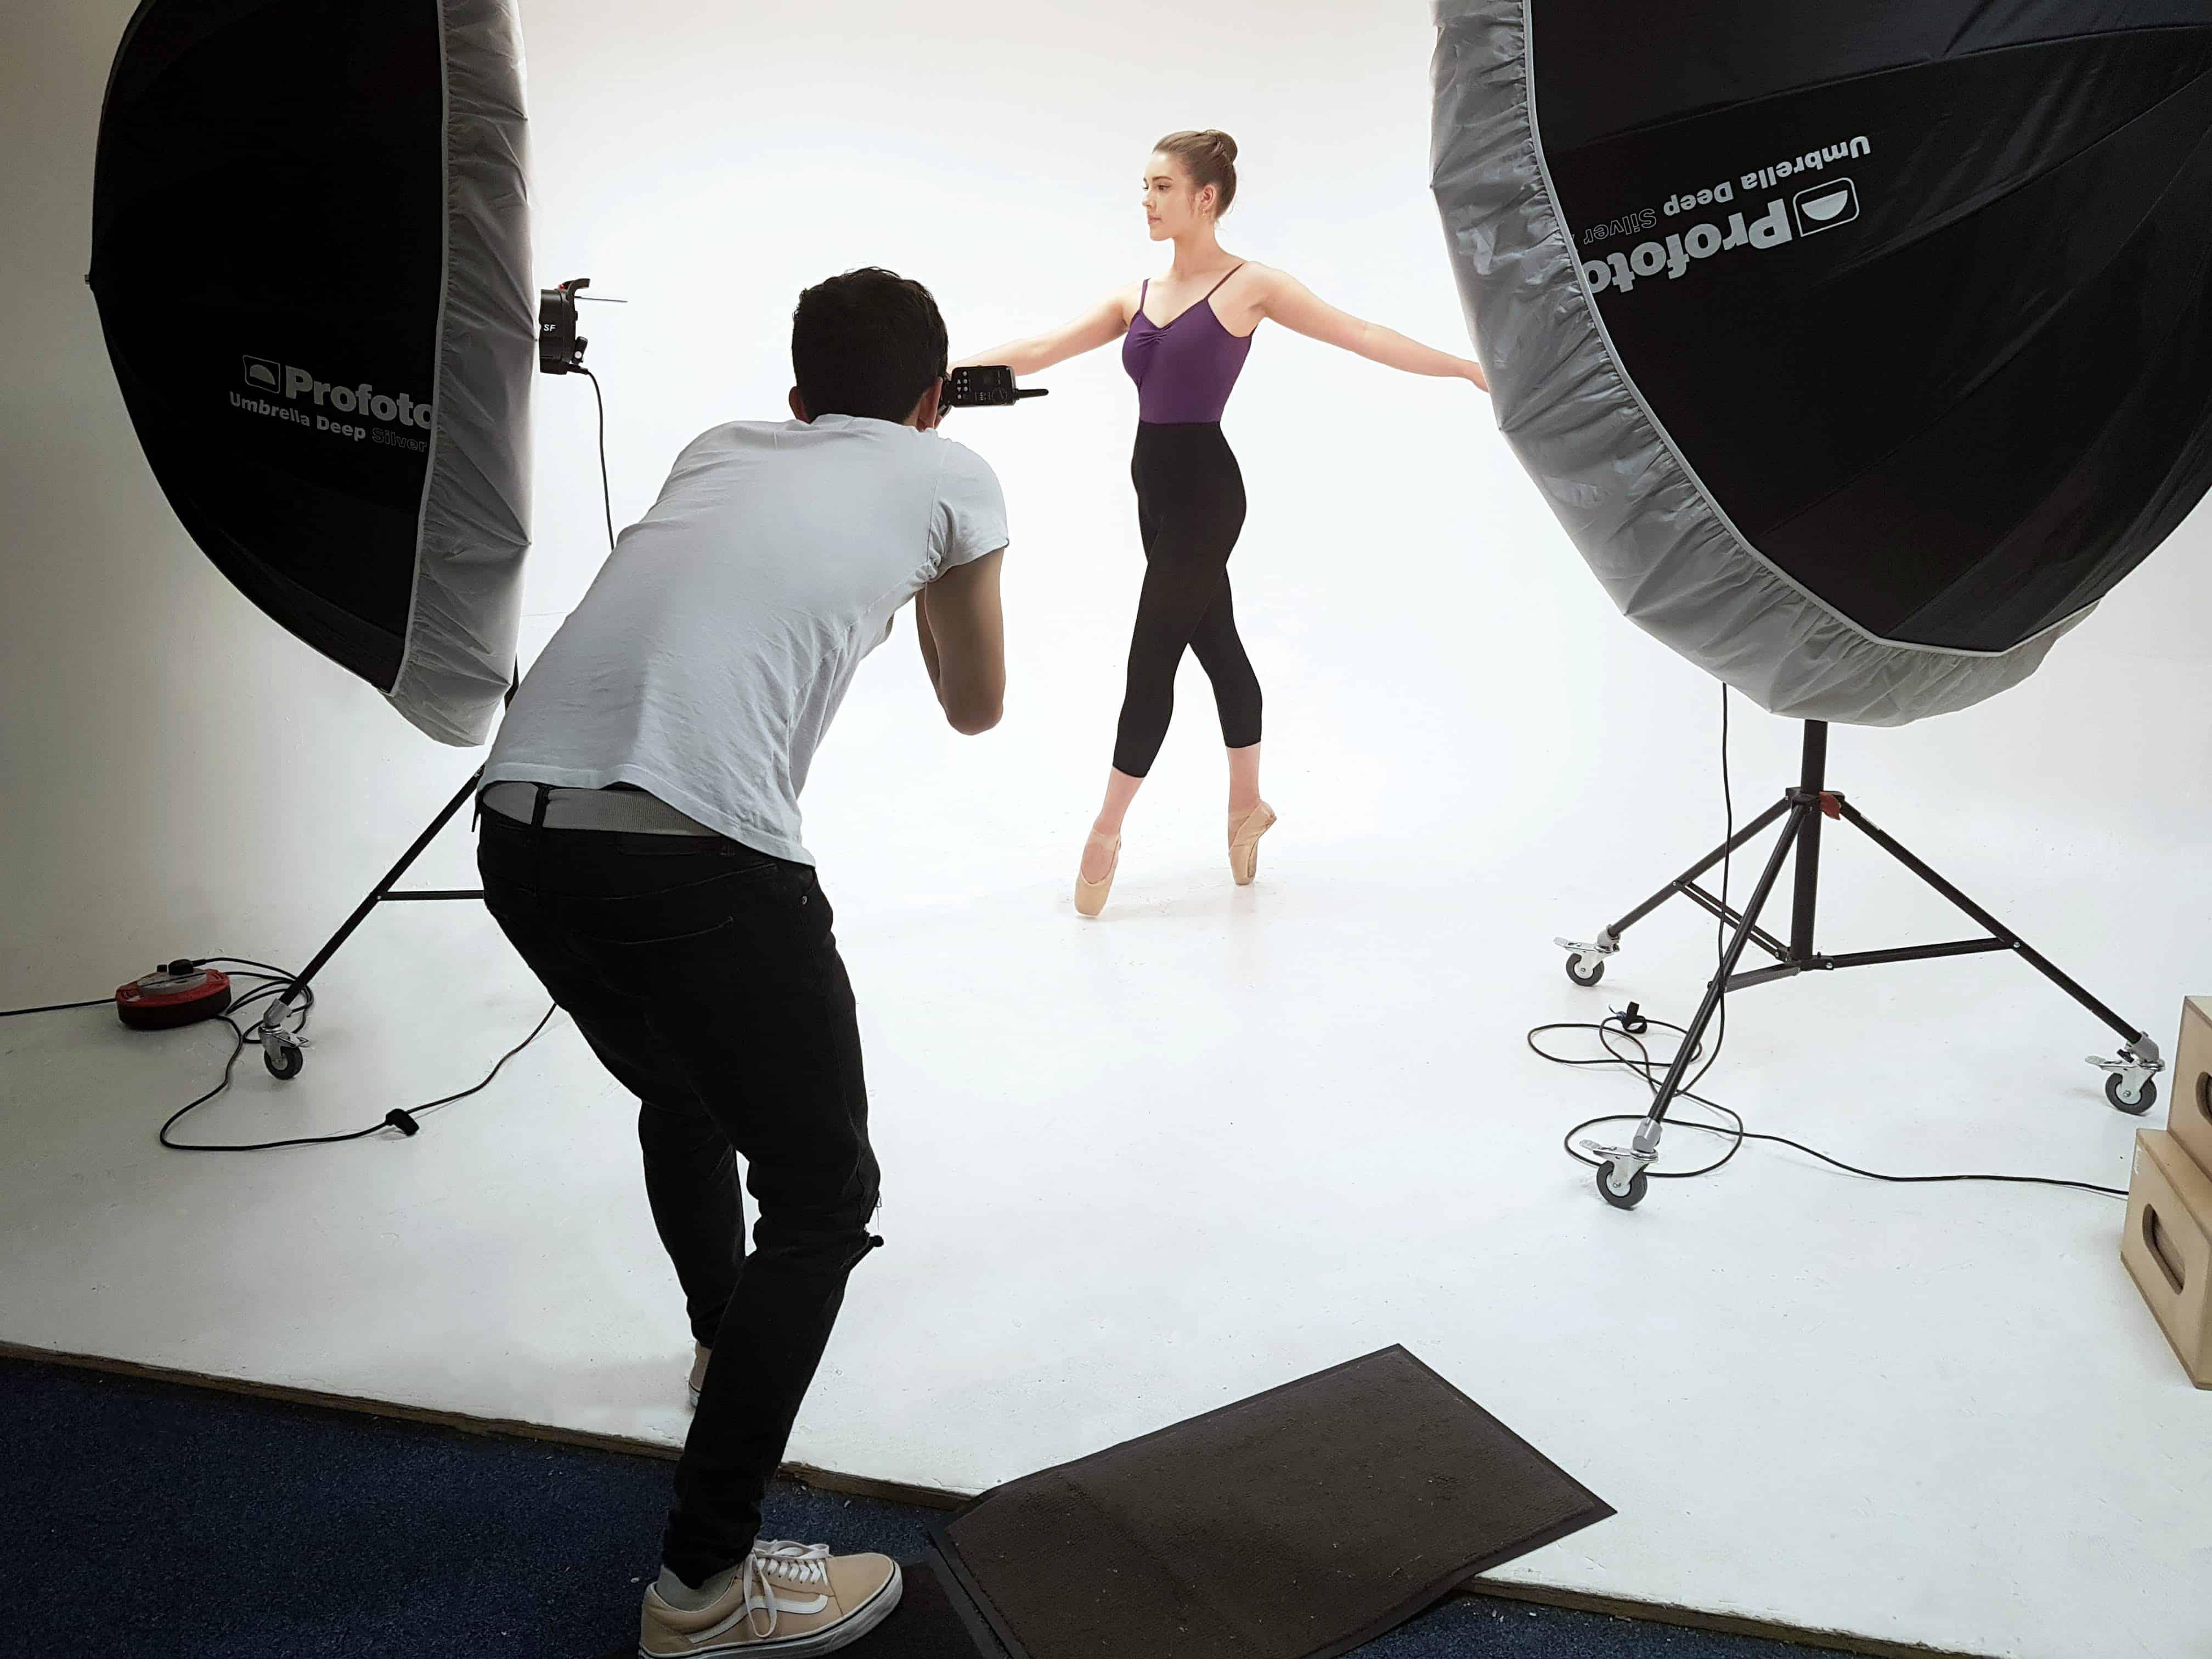 studio near hire london cheap looking photoshoot